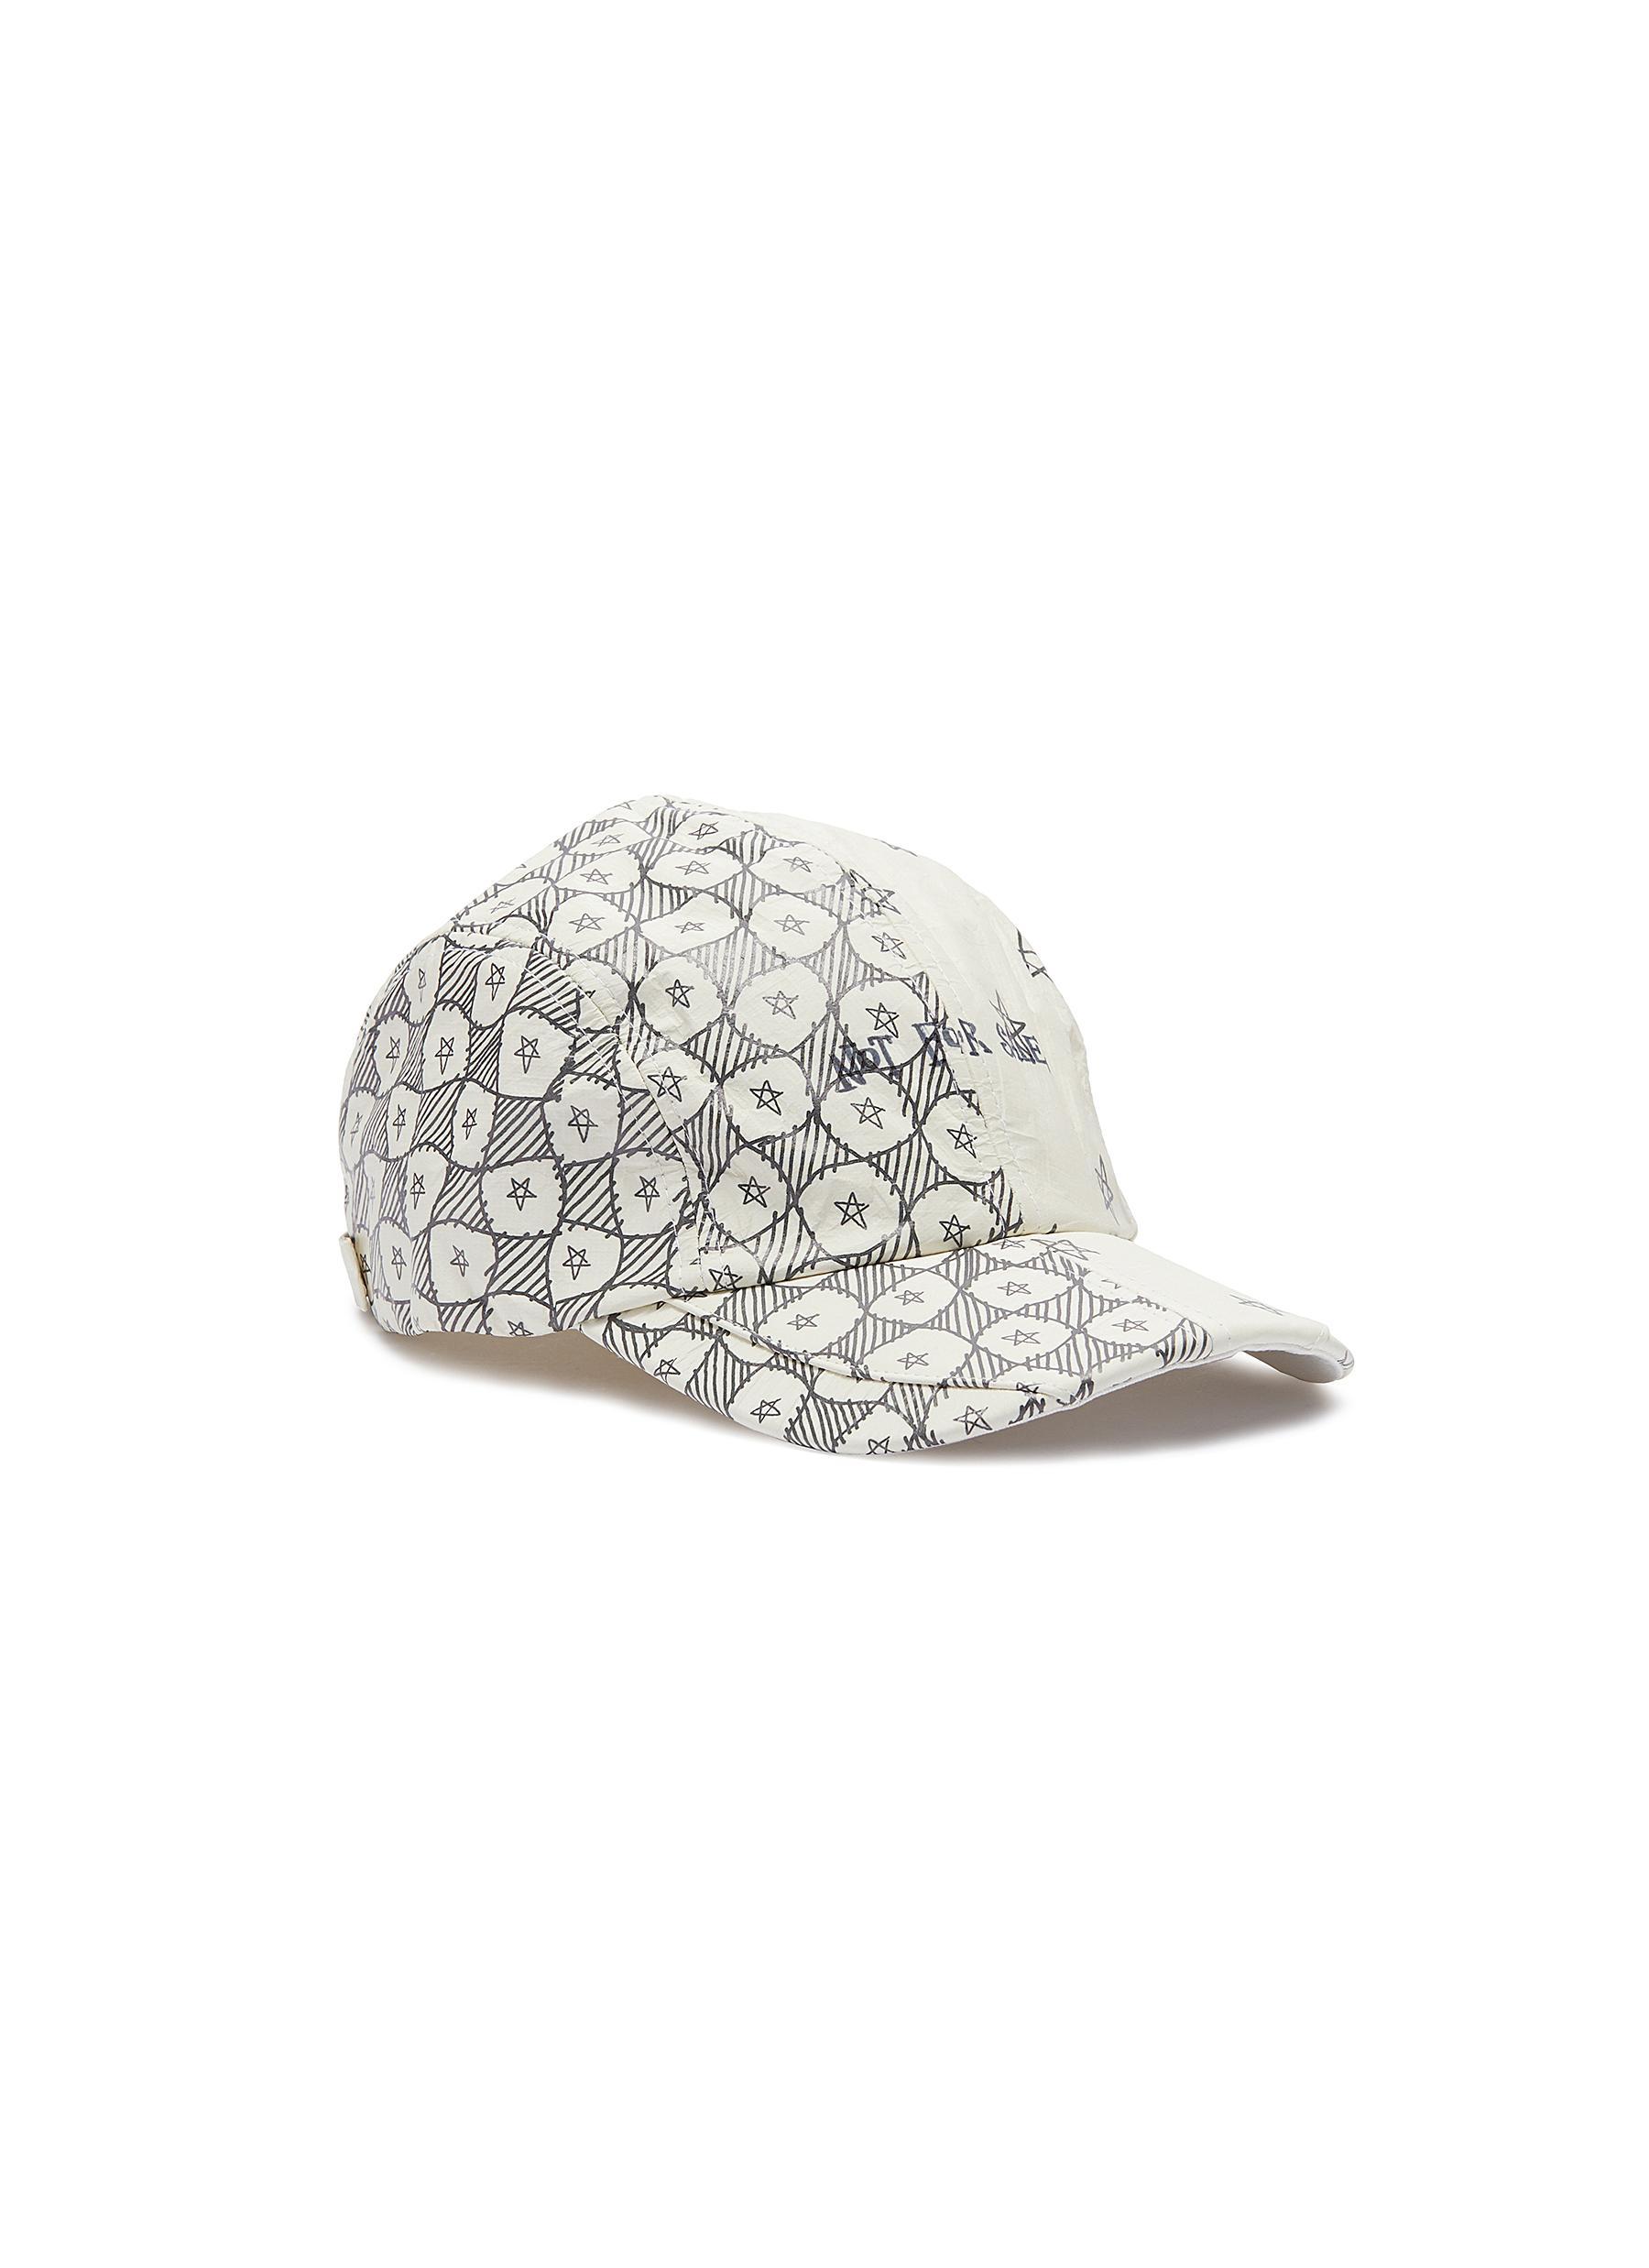 14ff98d33a011e SMFK | 'Not For Sale' star doodle print patchwork baseball cap ...